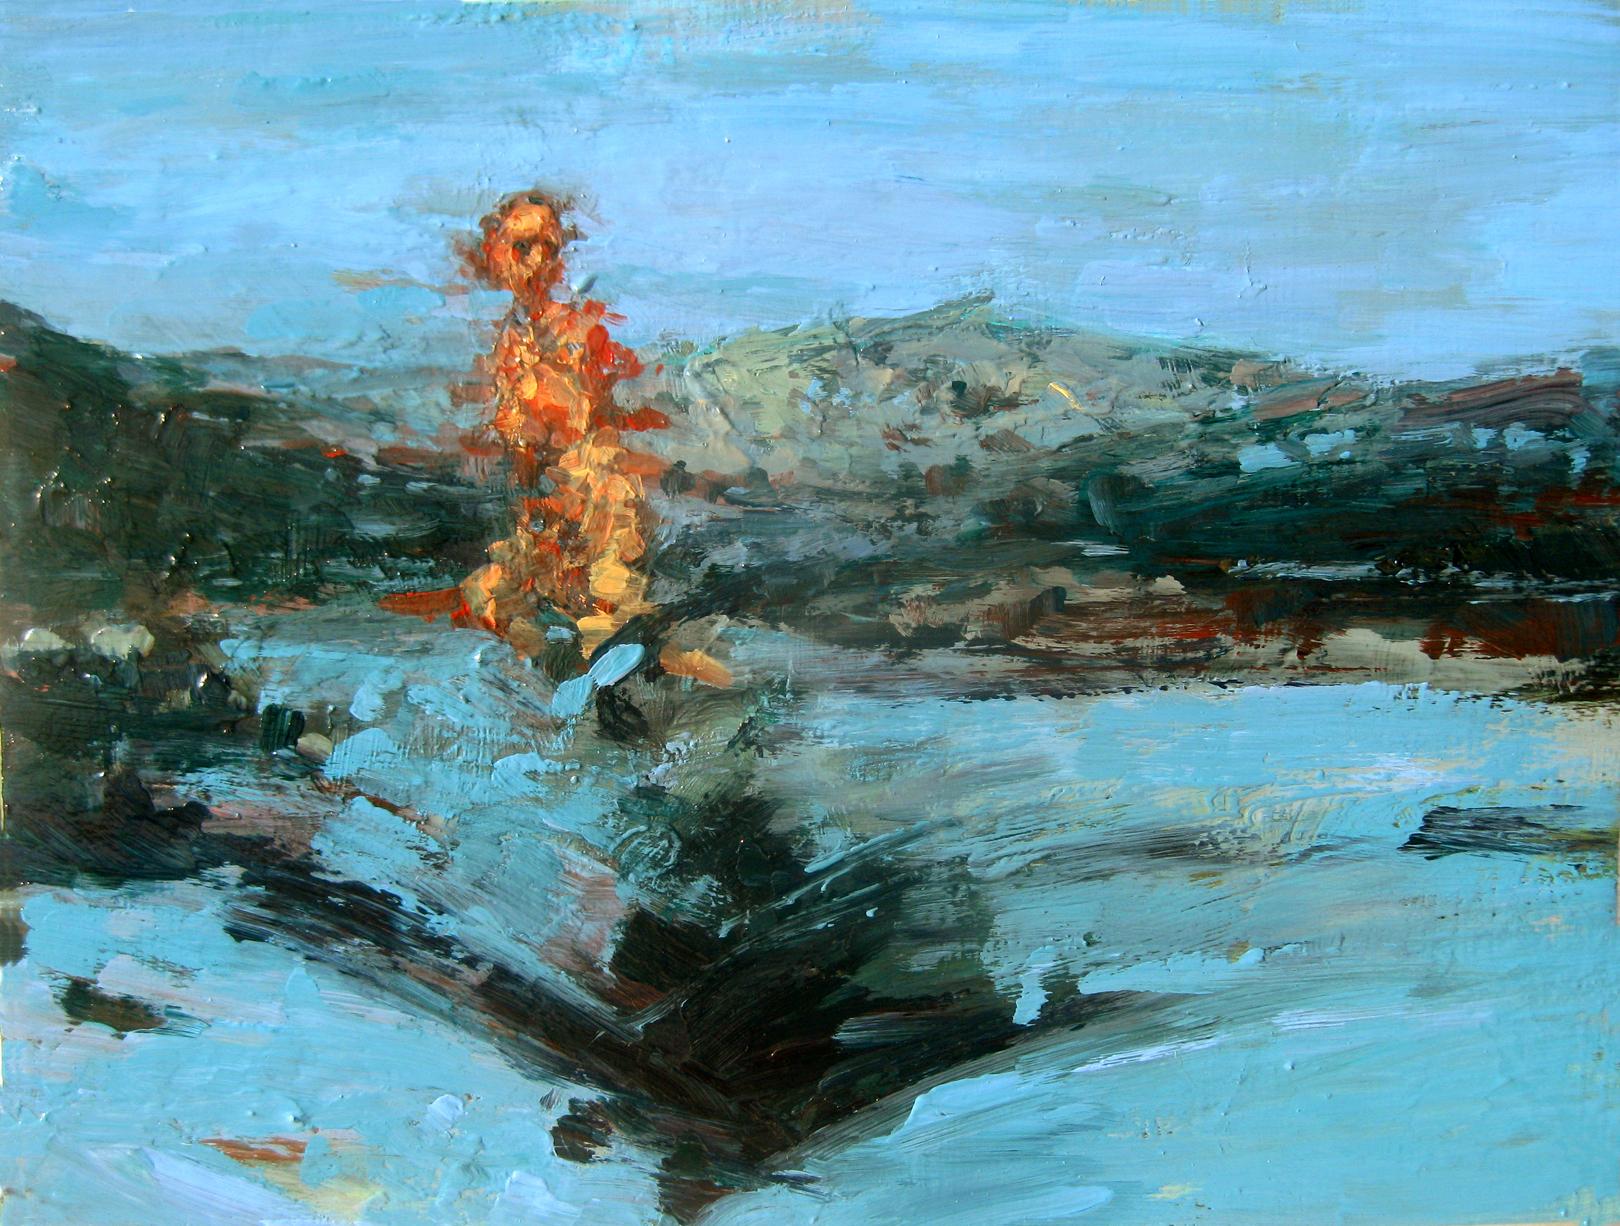 "Deluge (Naxos), oil on board, 9"" x 12"", 2011"